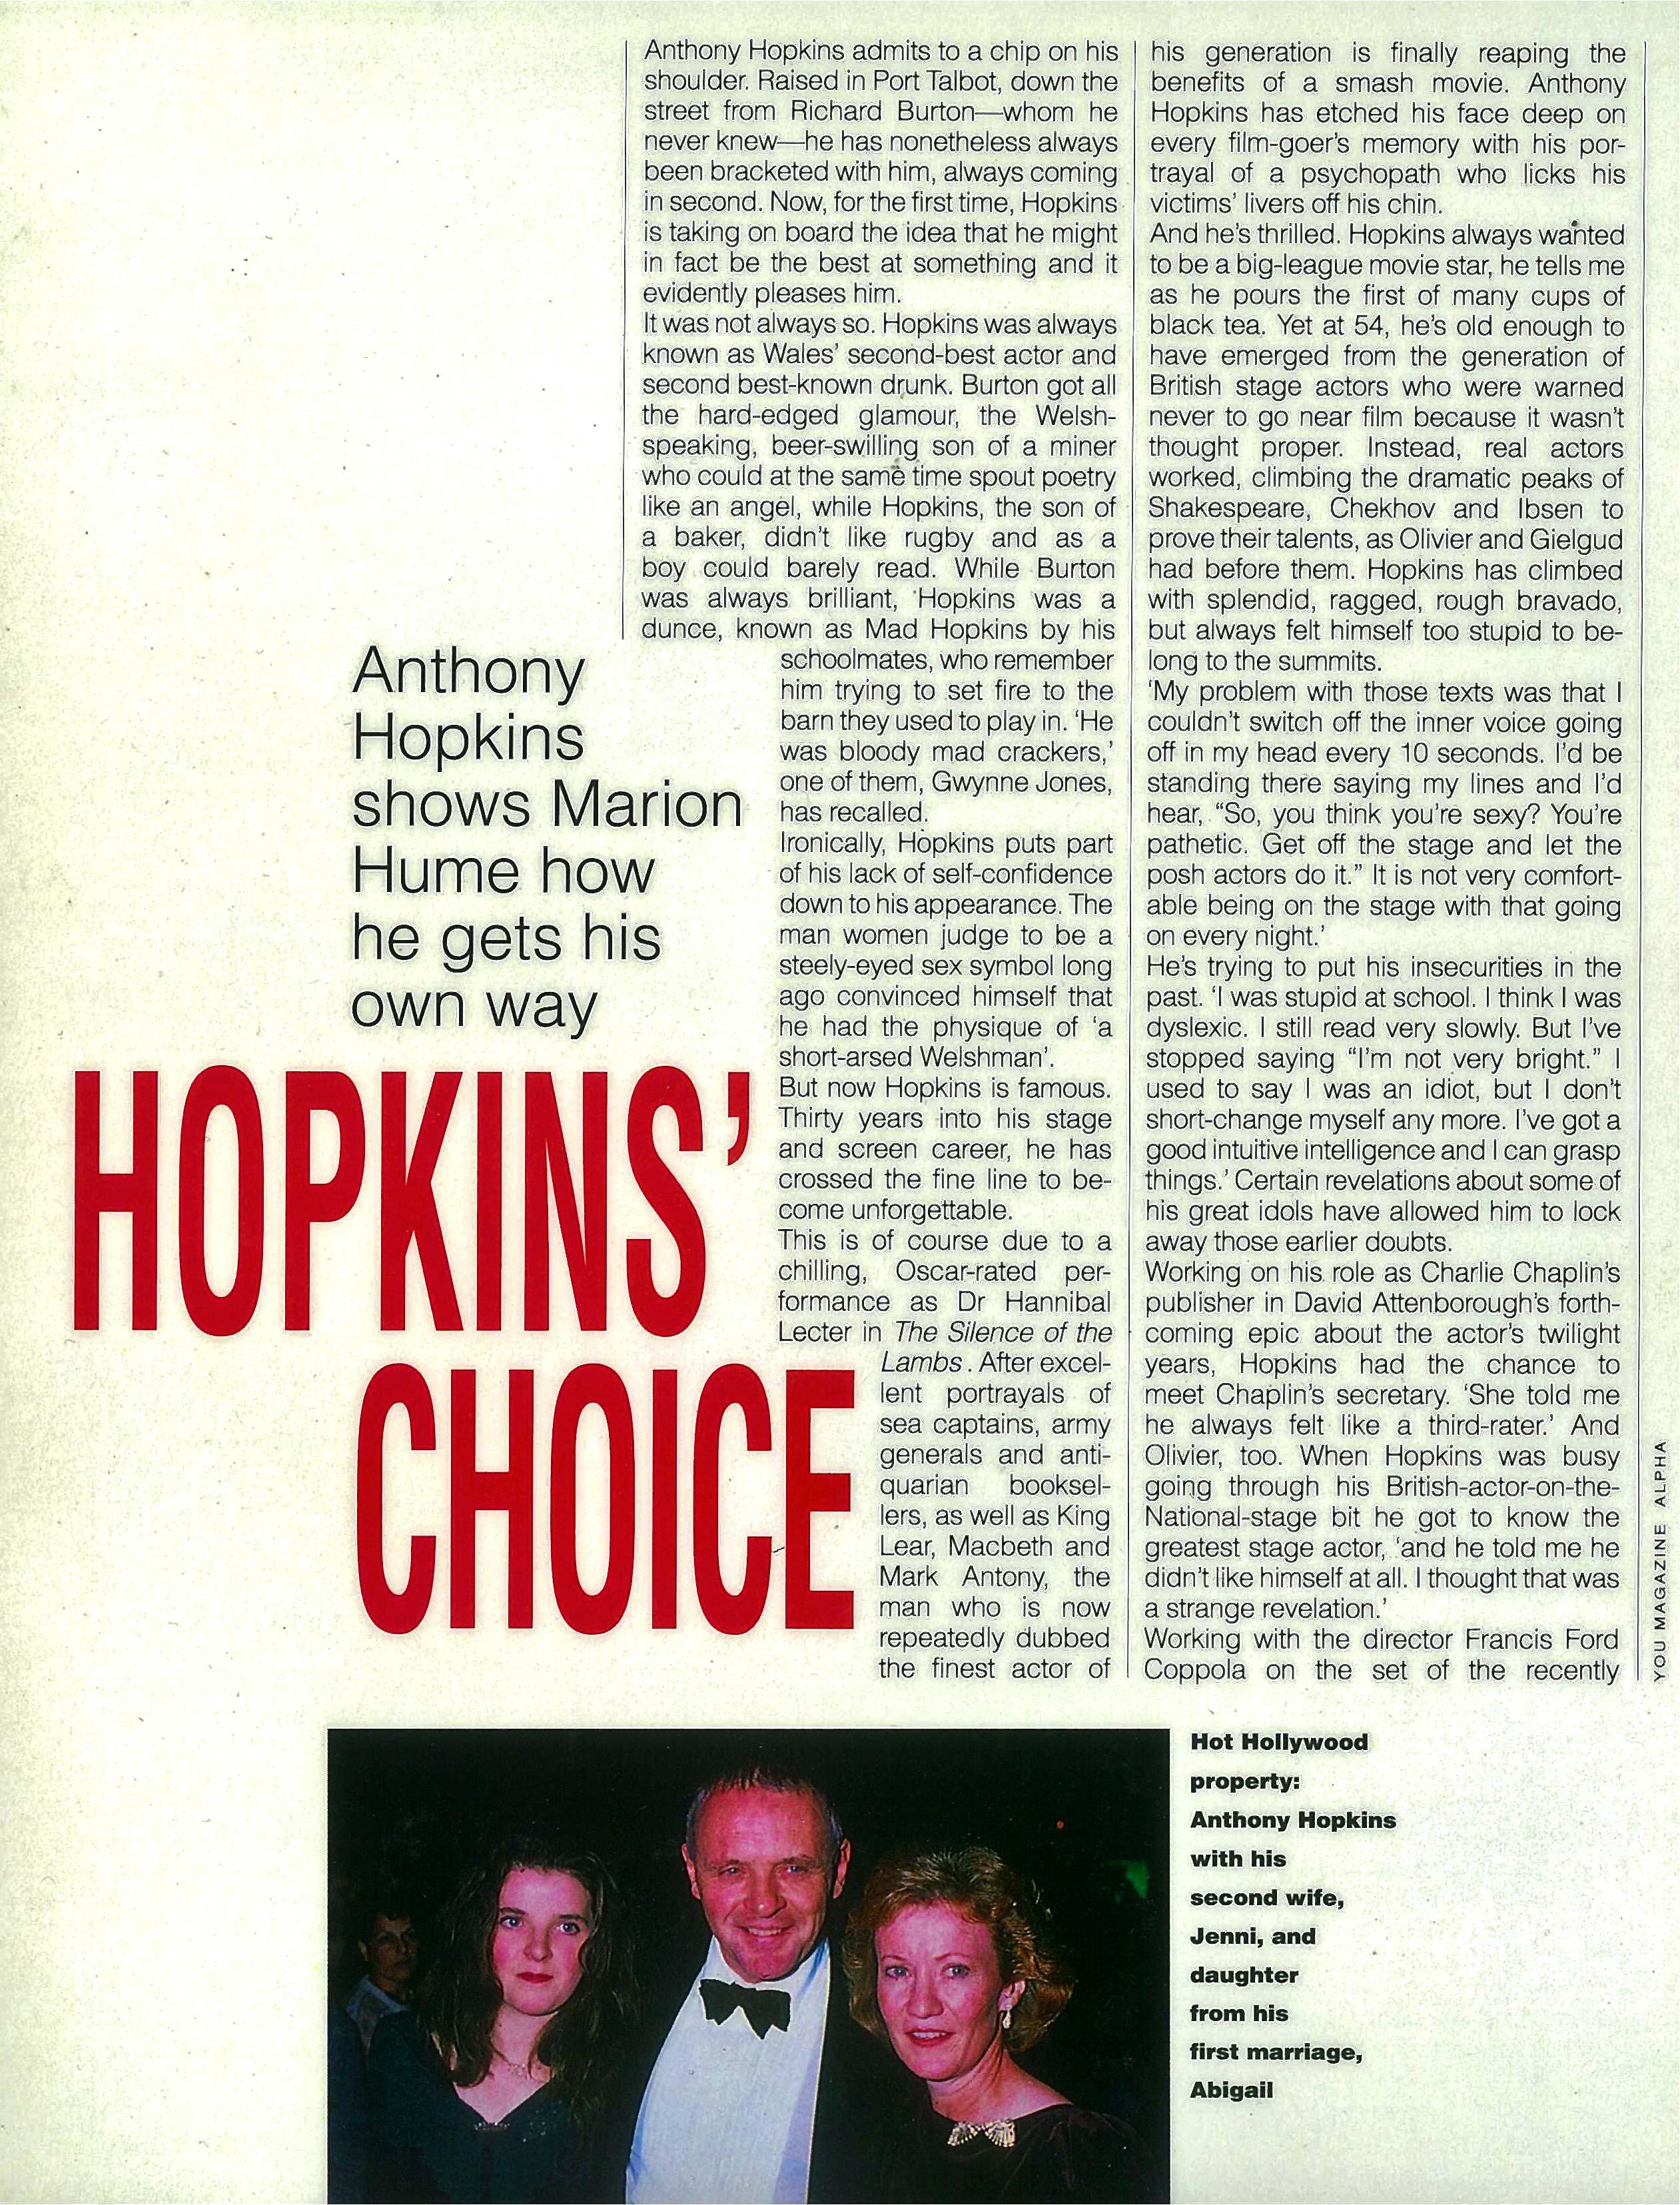 Ant-Hopkins-2